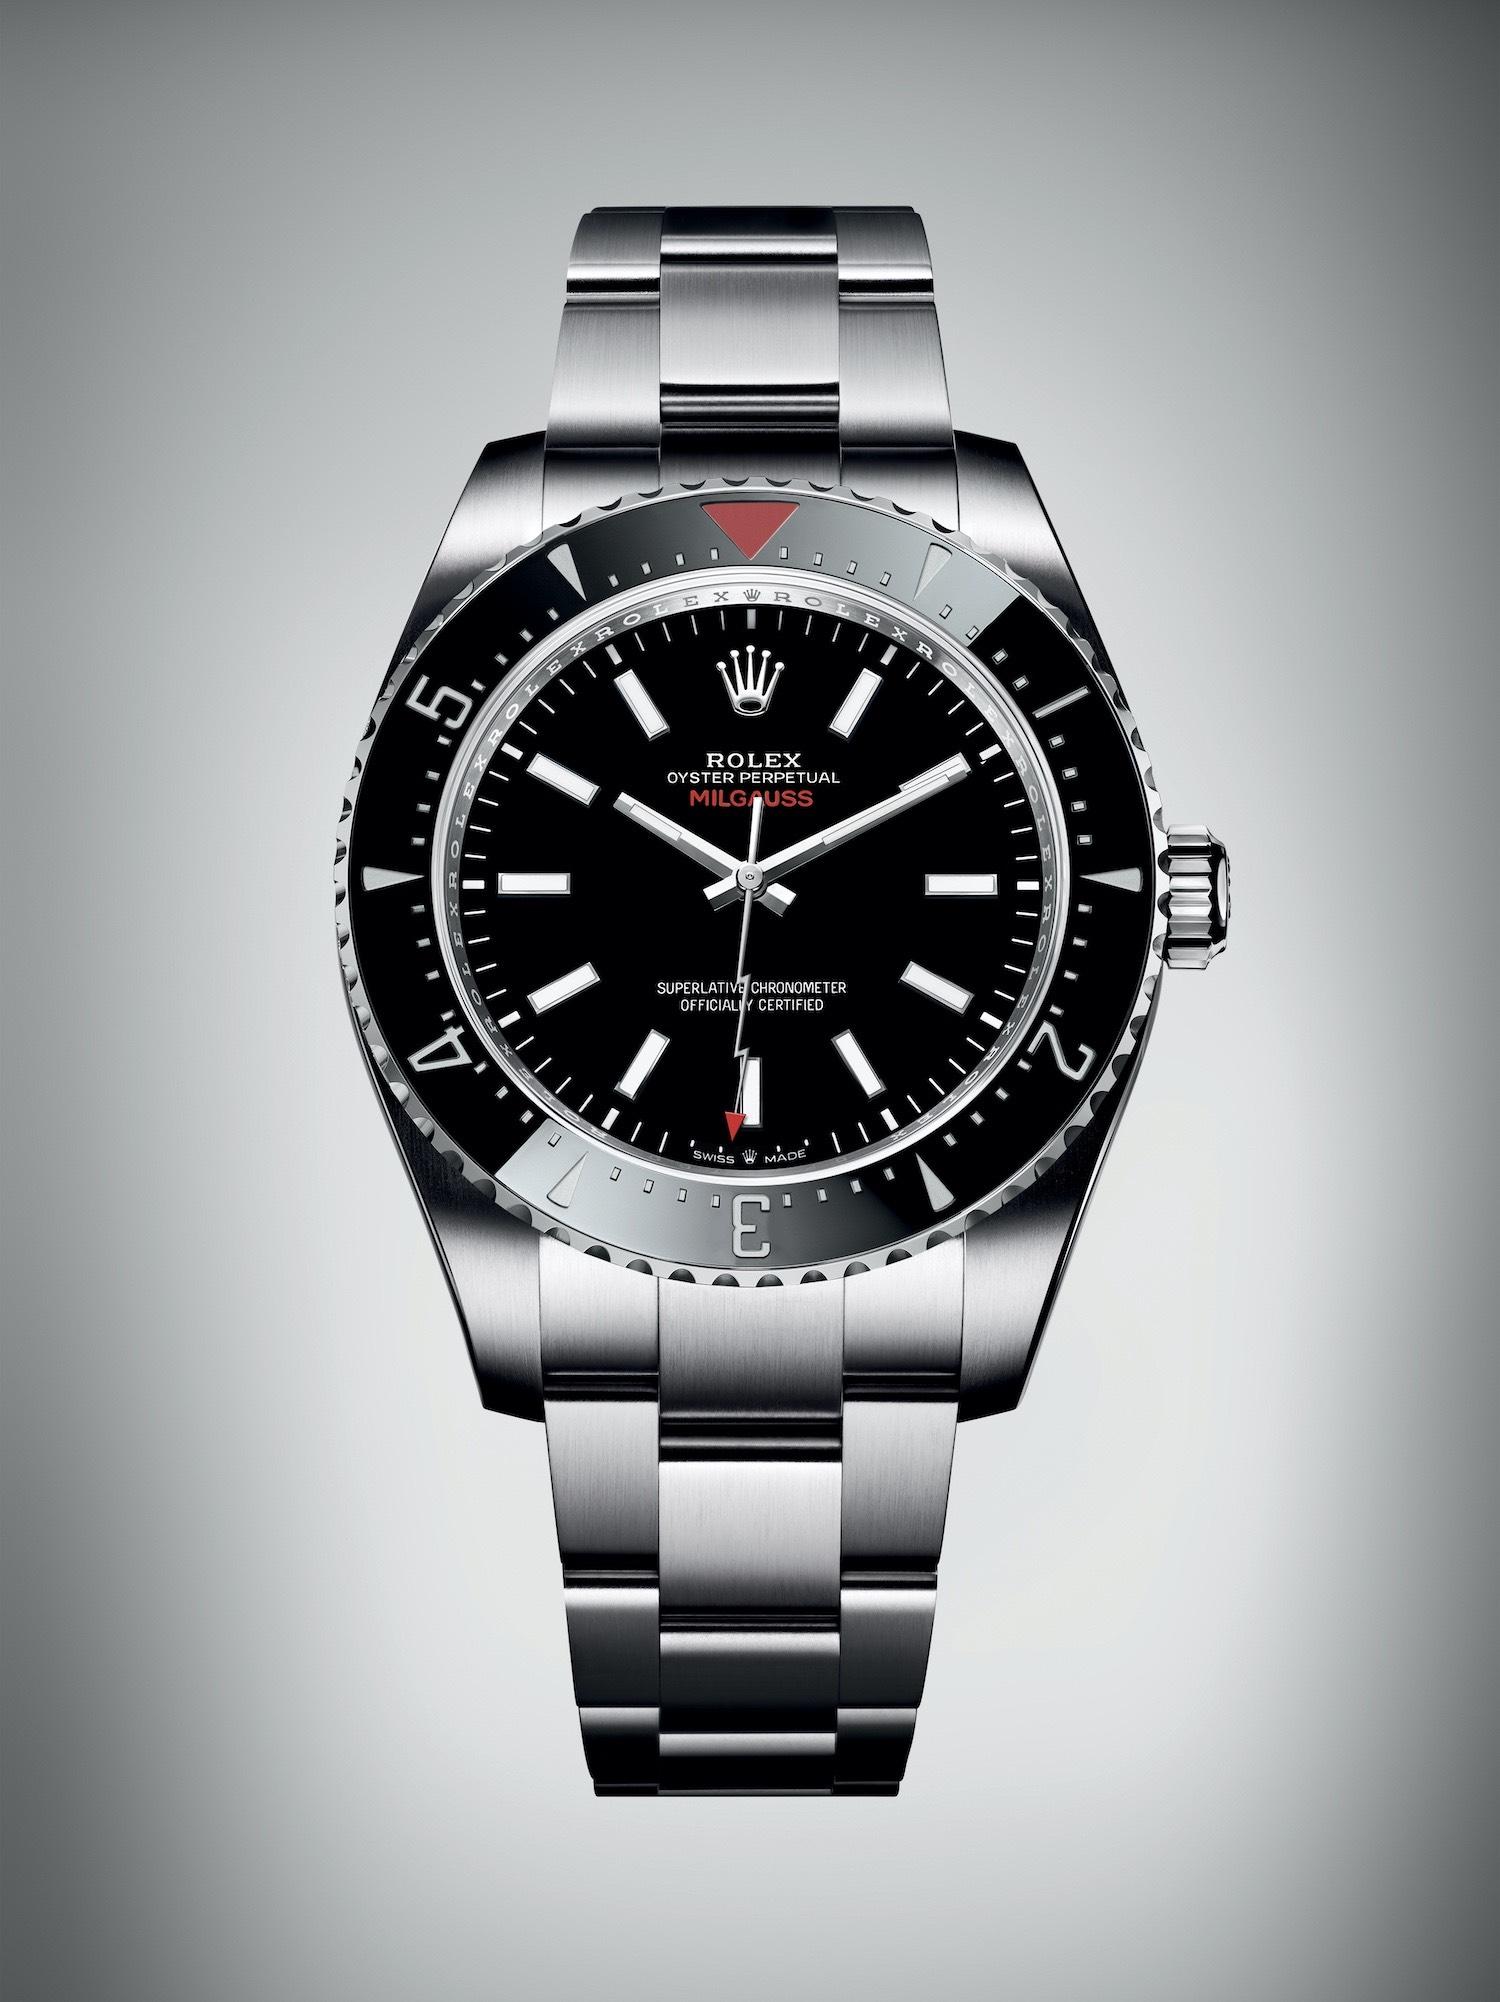 Rolex Milgauss Ceramic Bezel - Rolex Baselworld 2020 - Rolex 2020 Predictions